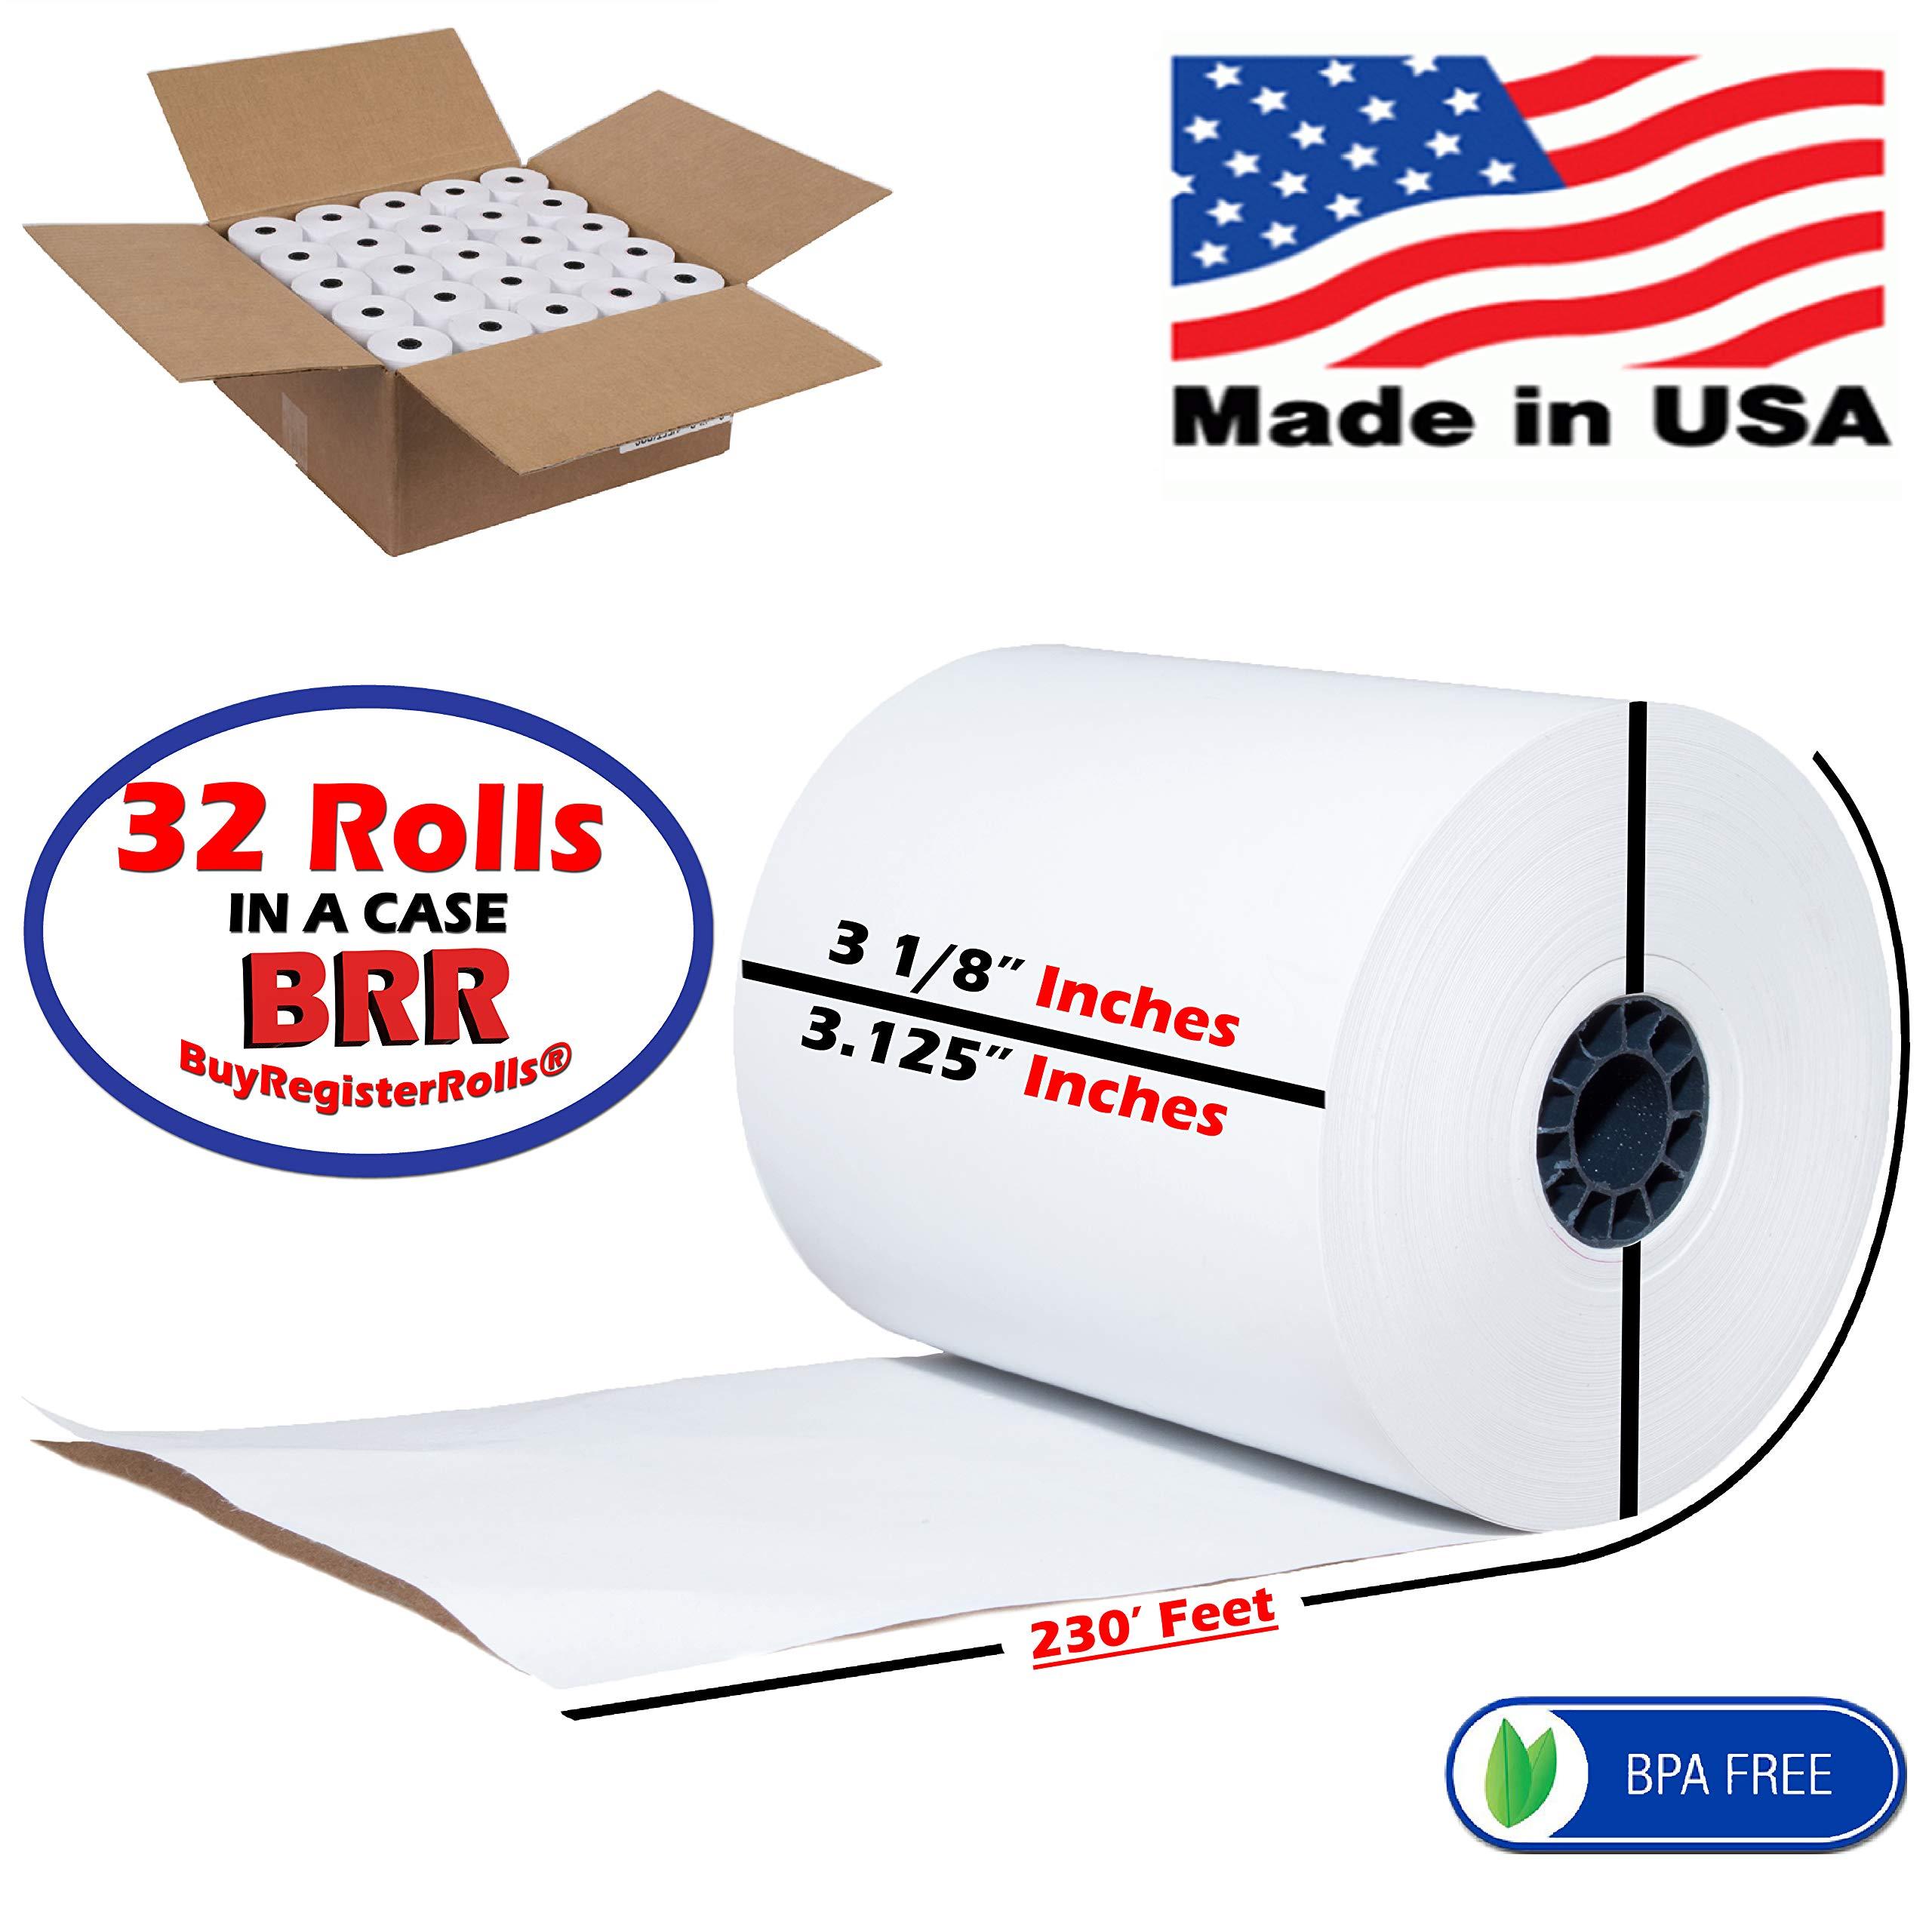 3 1/8 x 230 (32 Rolls) Thermal Paper roll Cash Register BPA Free Made in USA from BuyRegisterRolls by BuyRegisterRolls